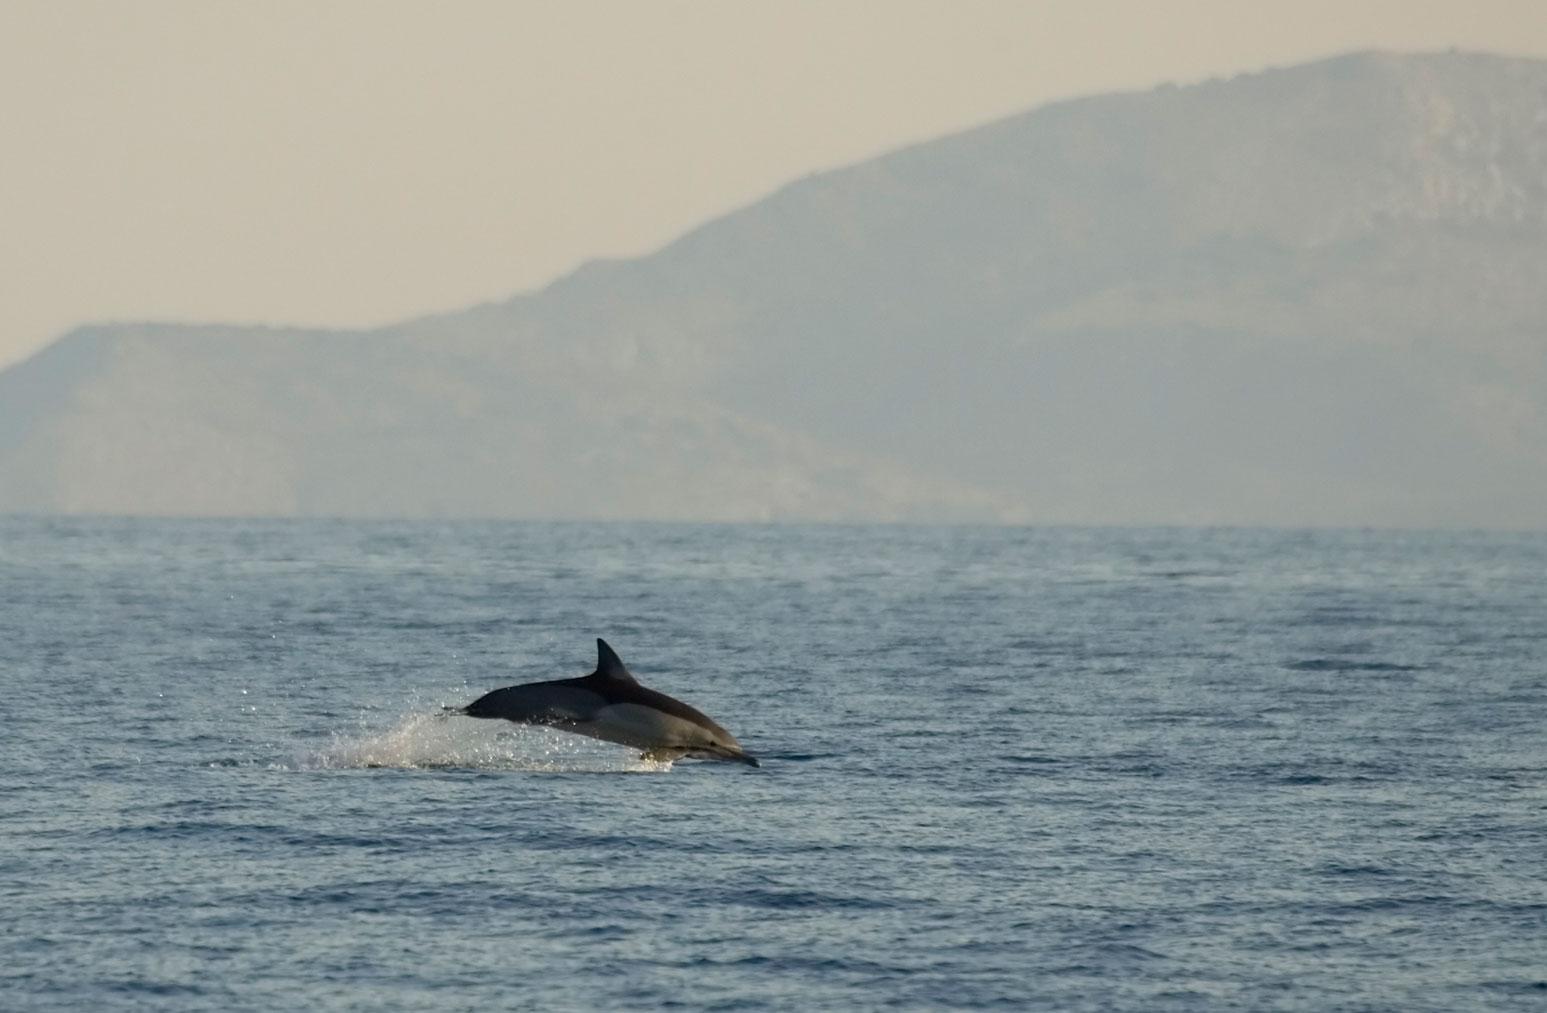 Cyclades wildlife sailing holiday 4